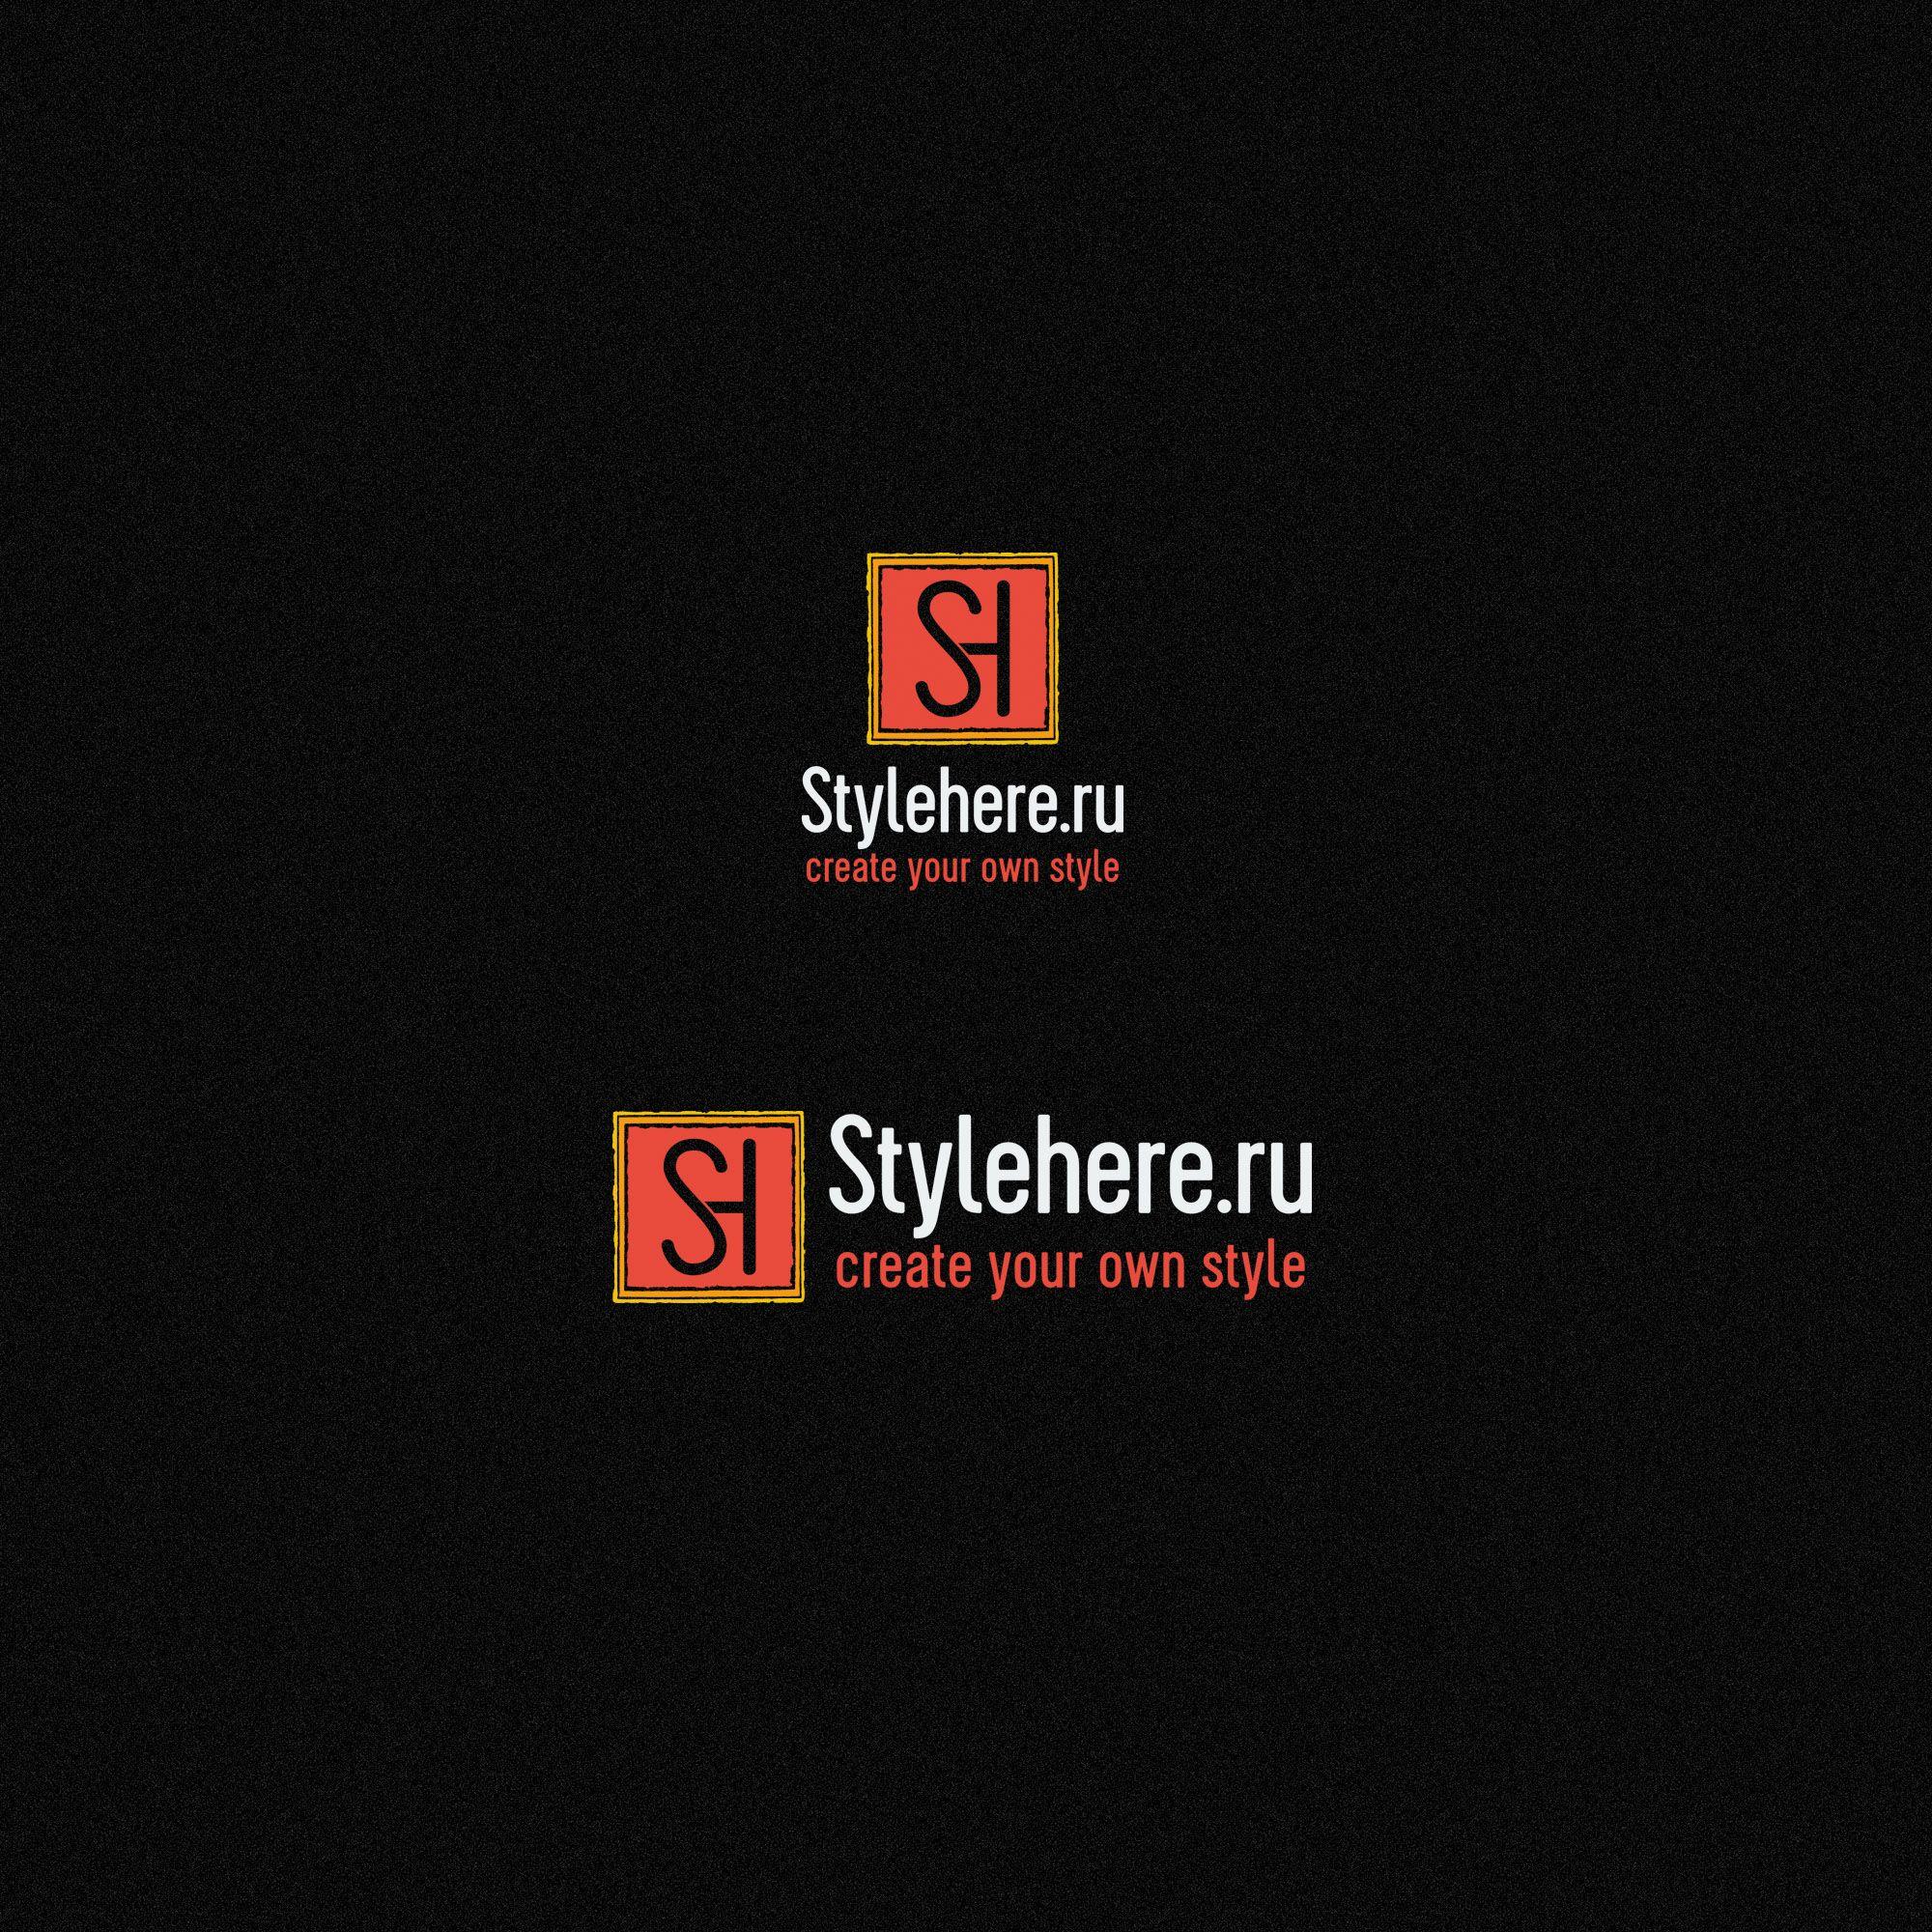 Логотип для интернет-магазина stylehere.ru - дизайнер Gas-Min